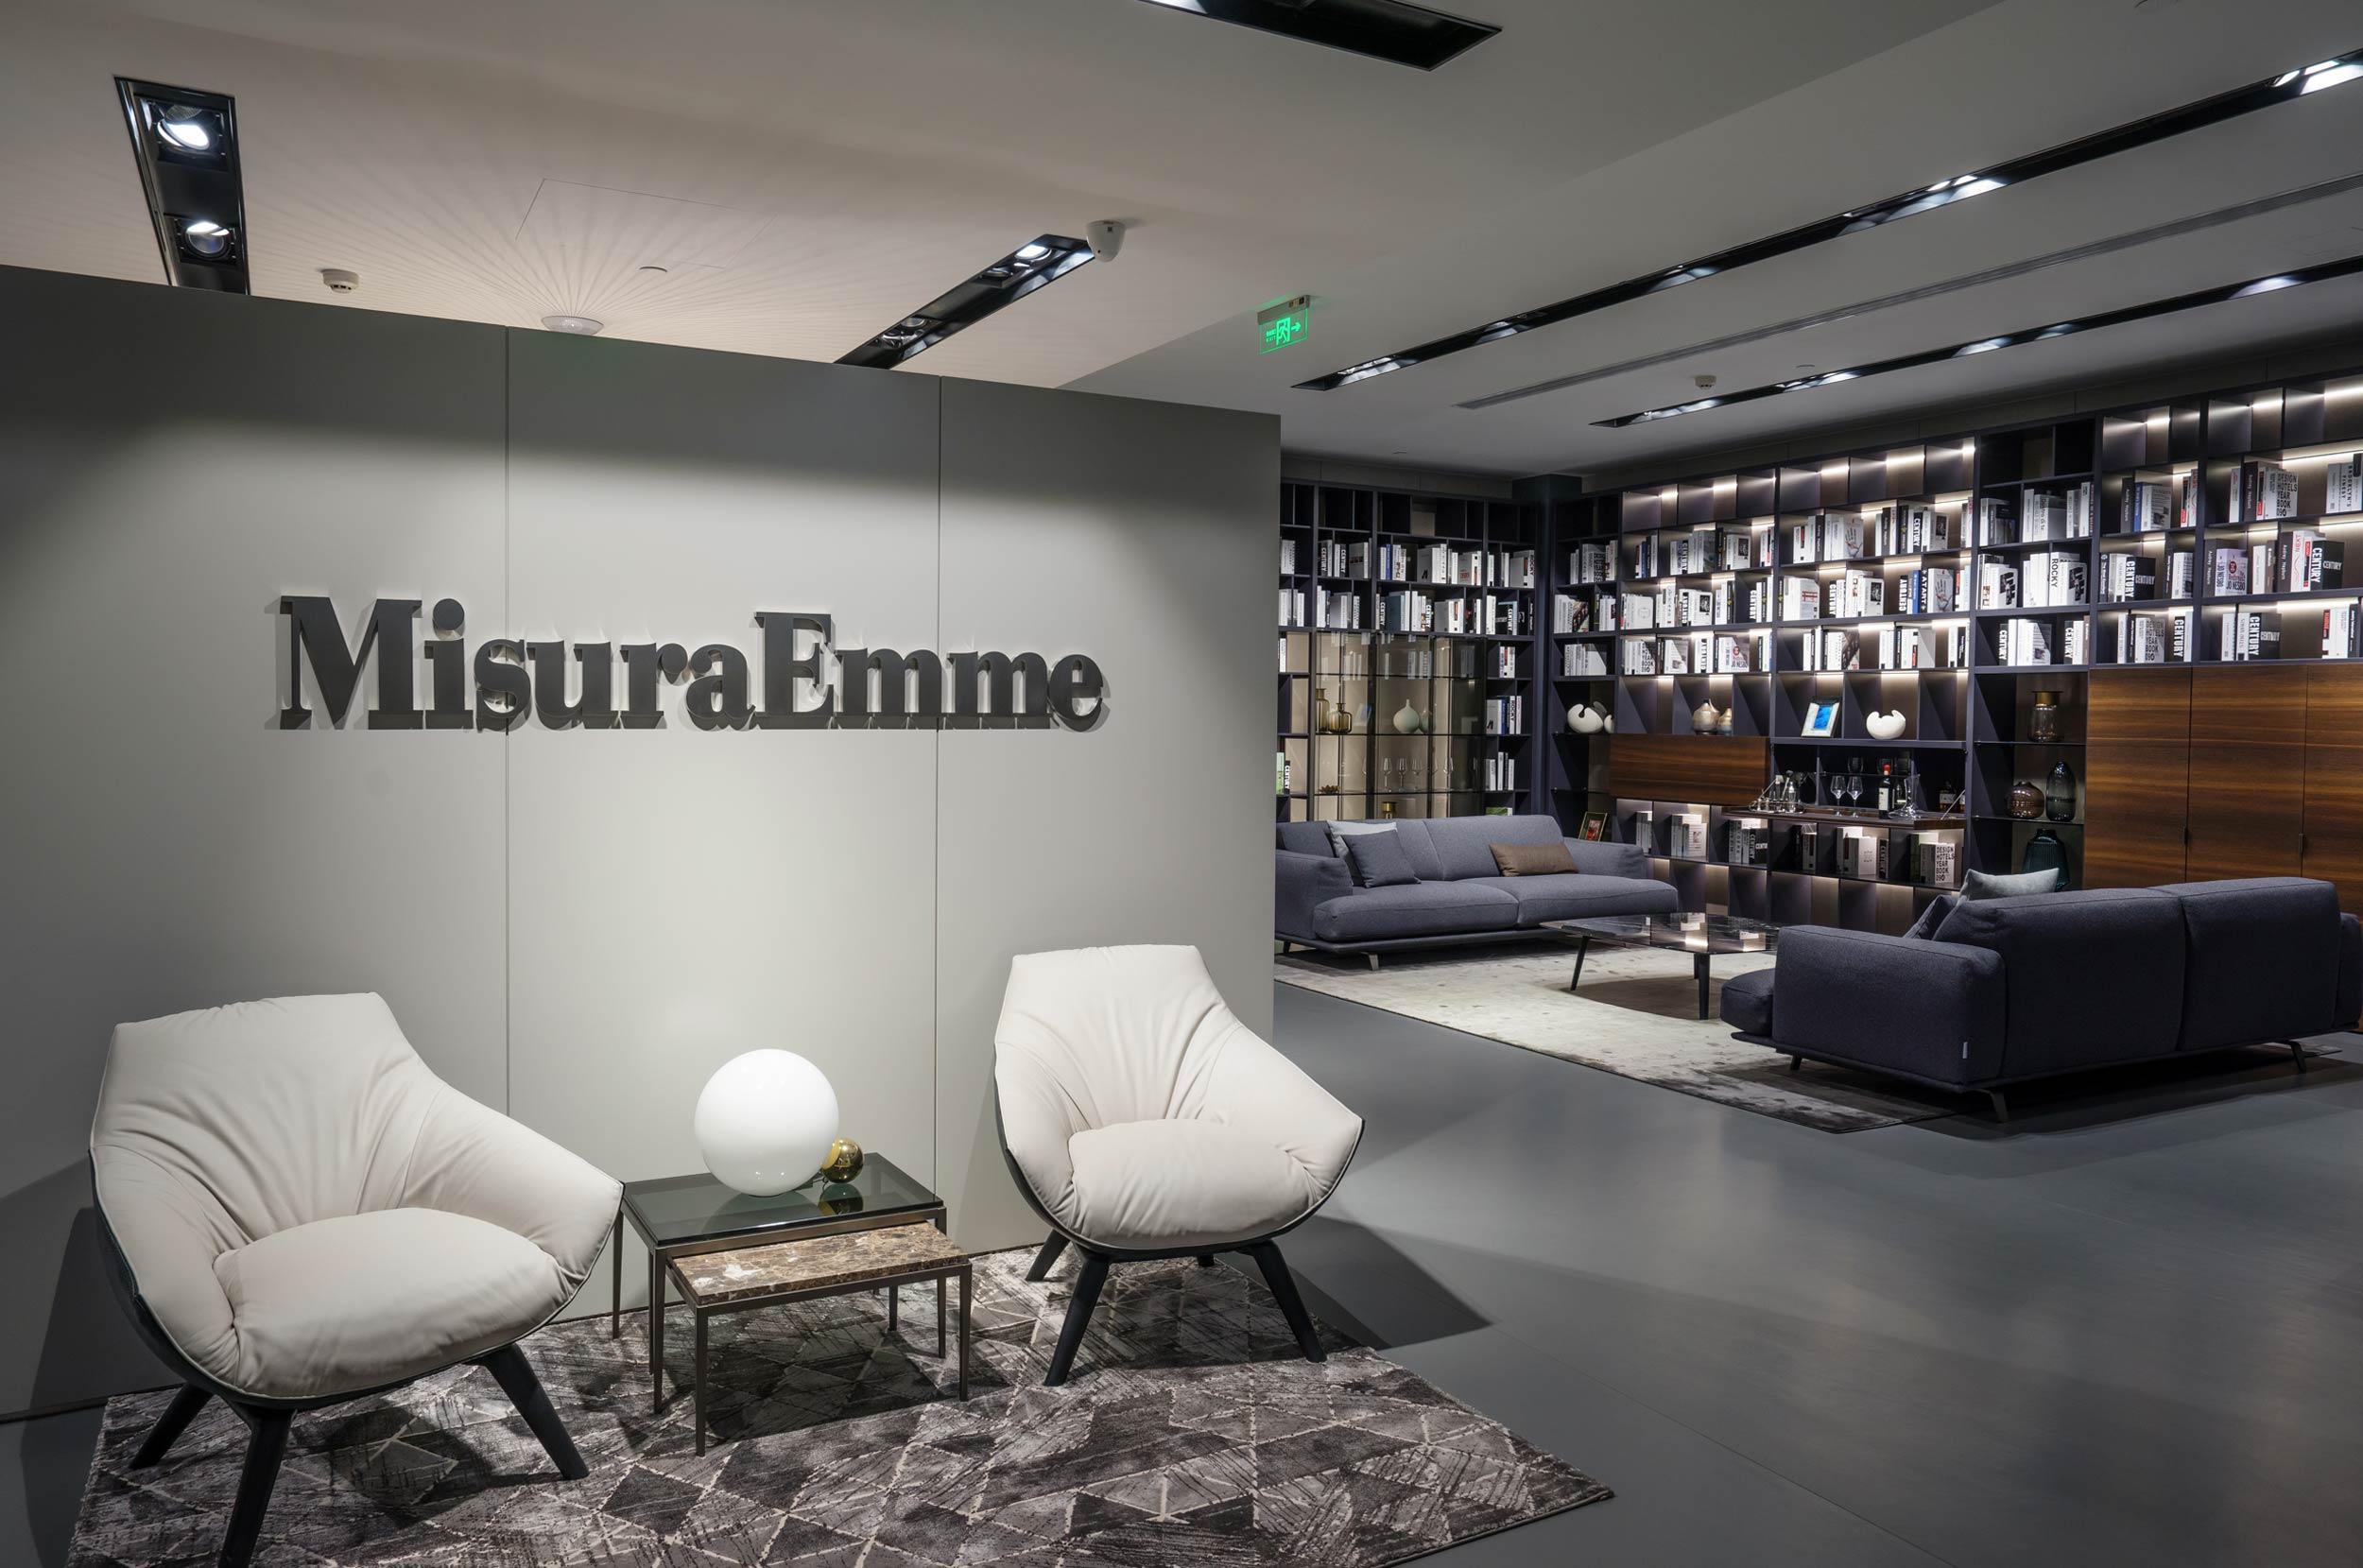 Design furniture Made in Italy | MisuraEmme